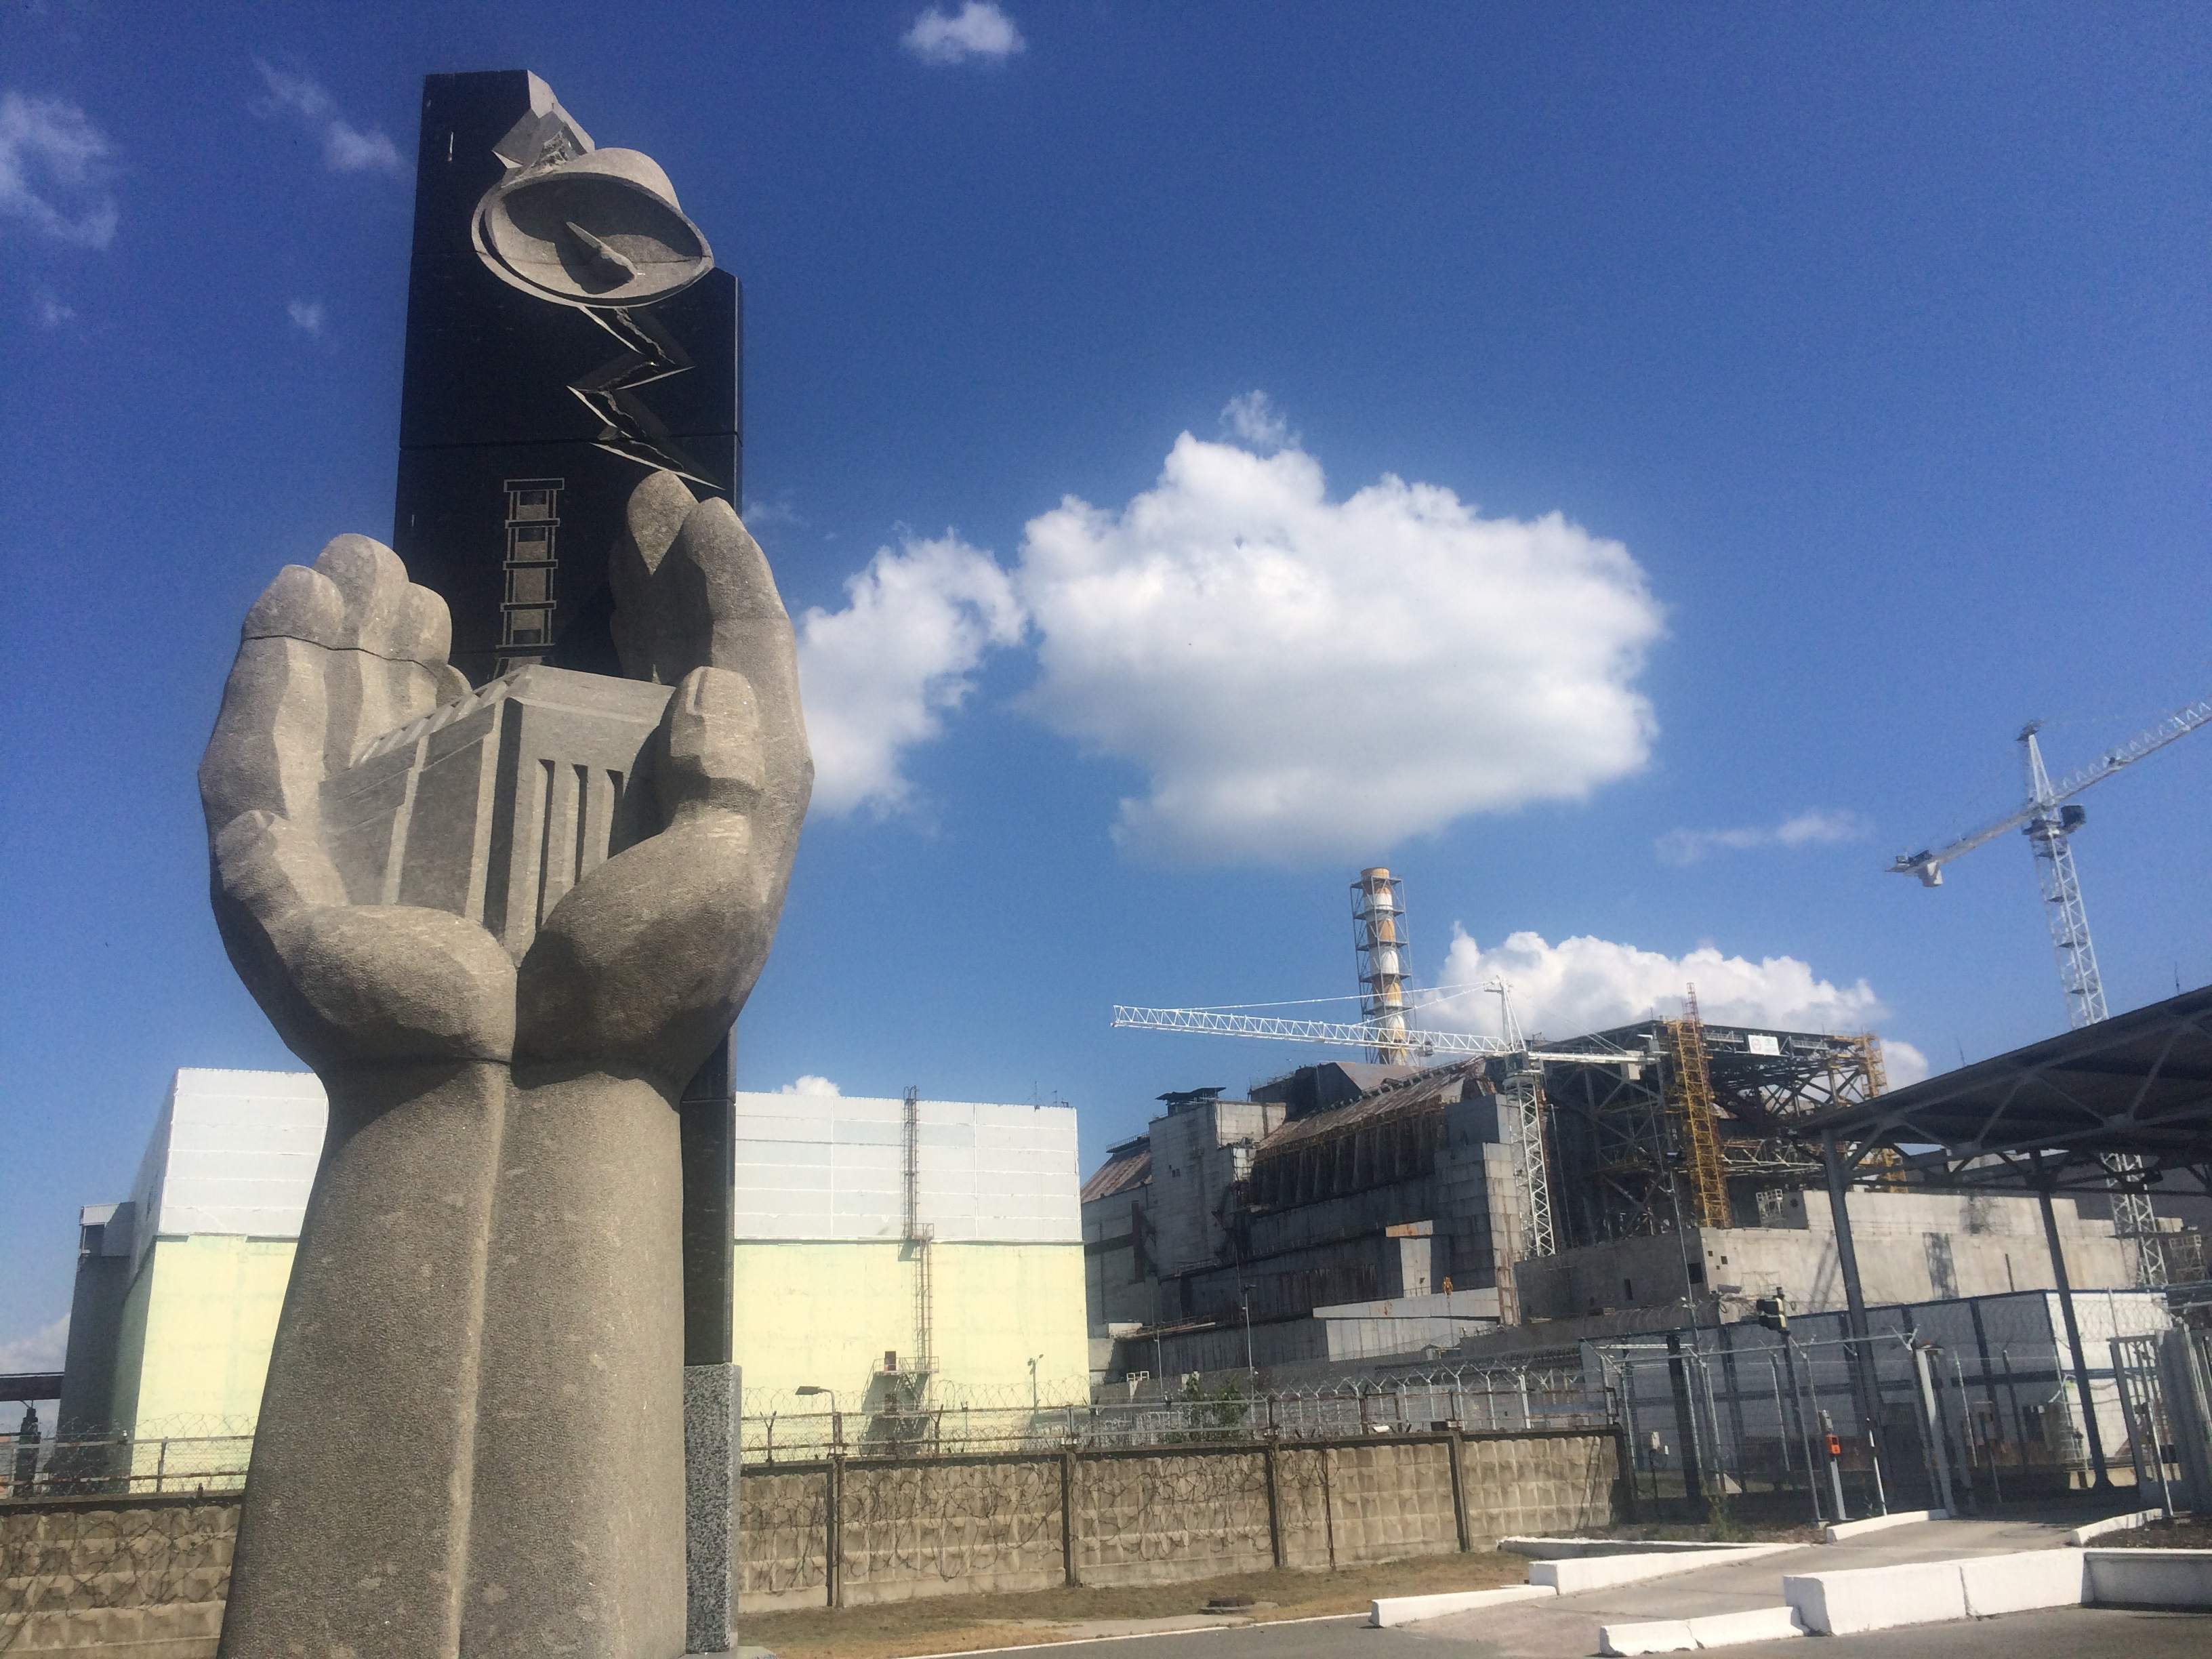 Reactor 4, the original sarcophagus, and the reactor 4 memorial. Source: Robynne Mellor